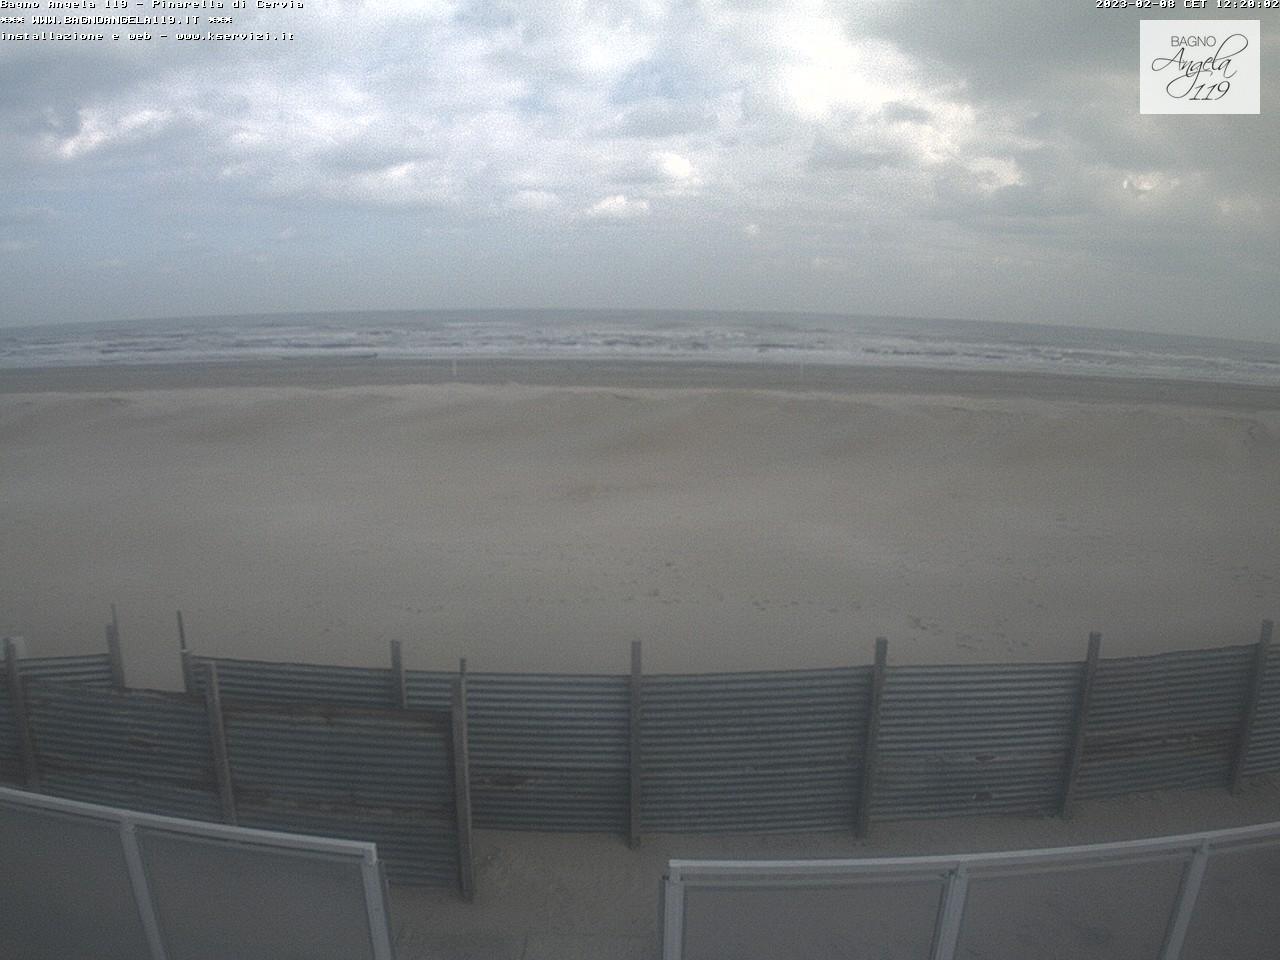 Webcam Pinarella di Cervia Bagno Angela Beach